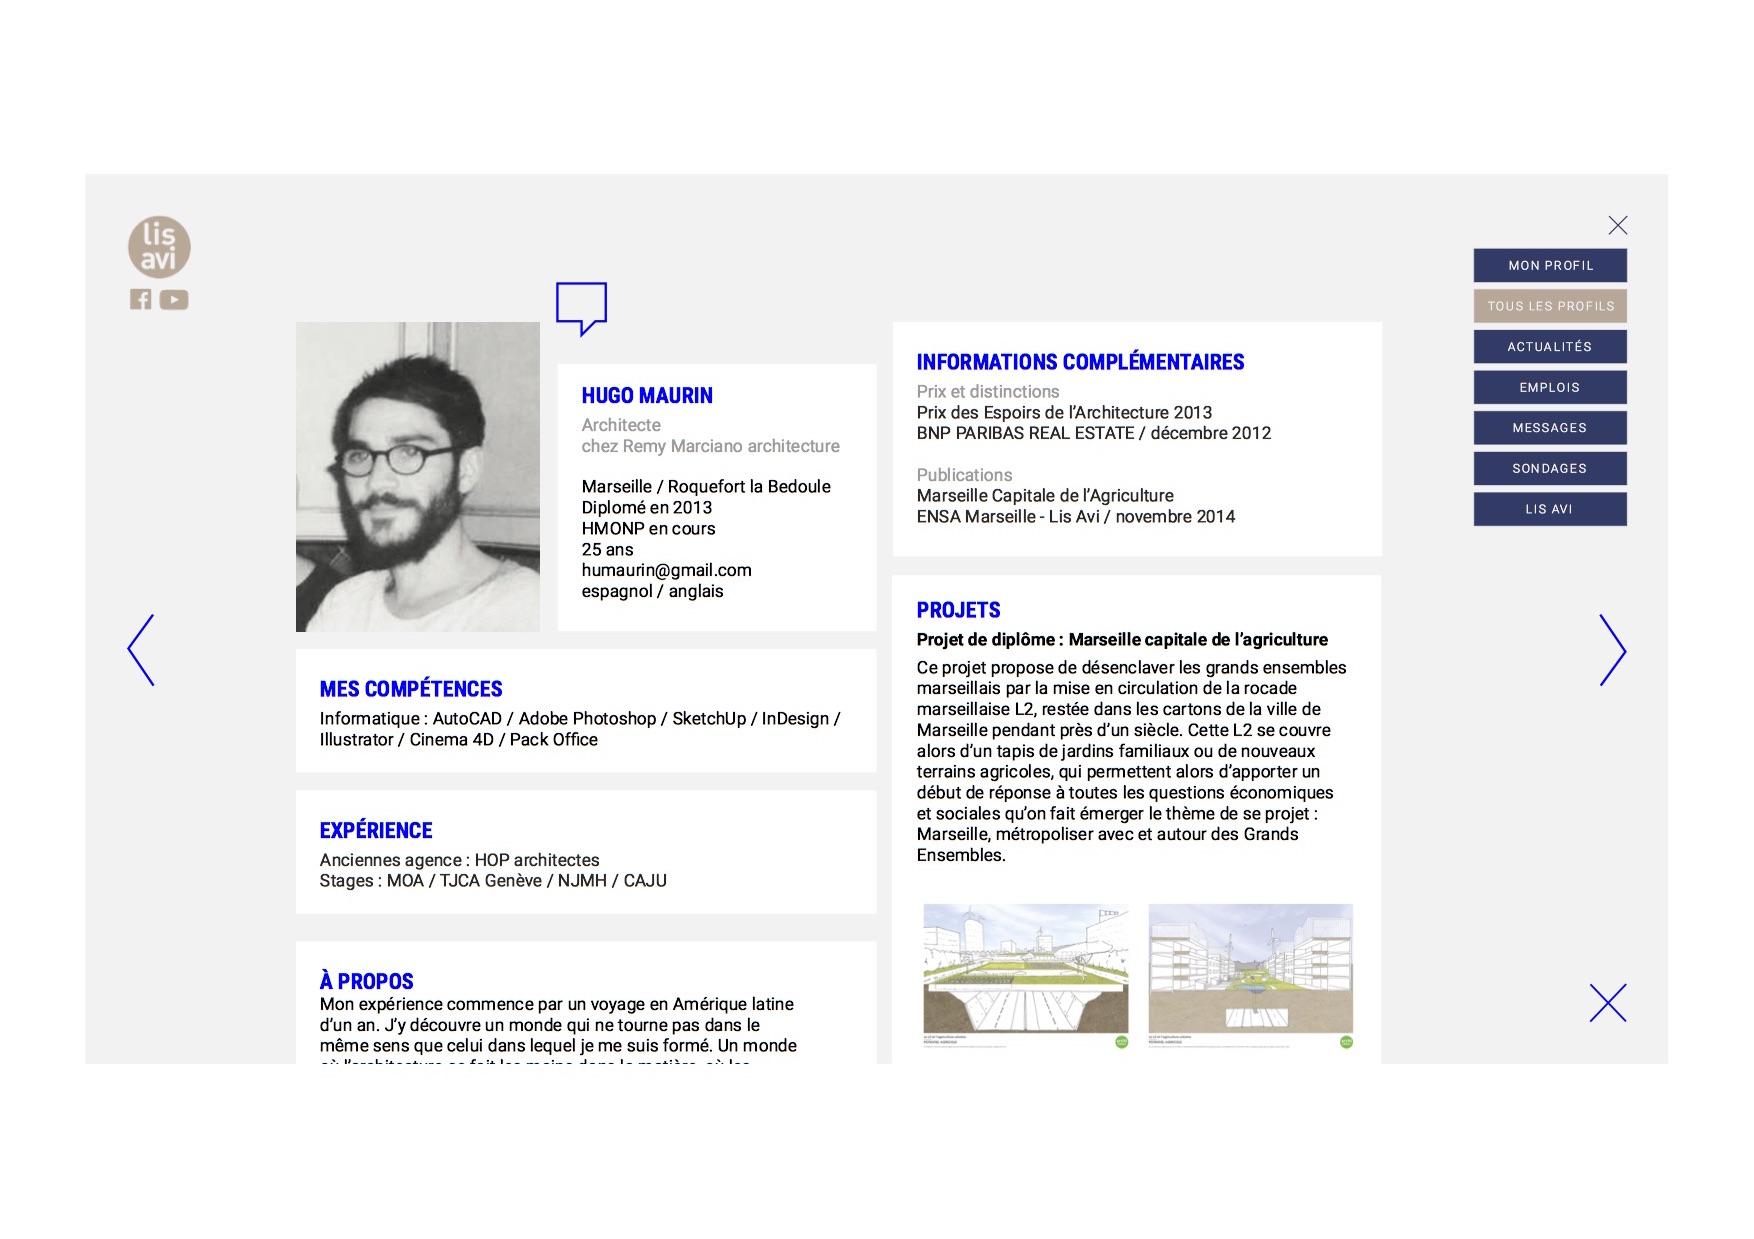 profil-1488728836.jpg